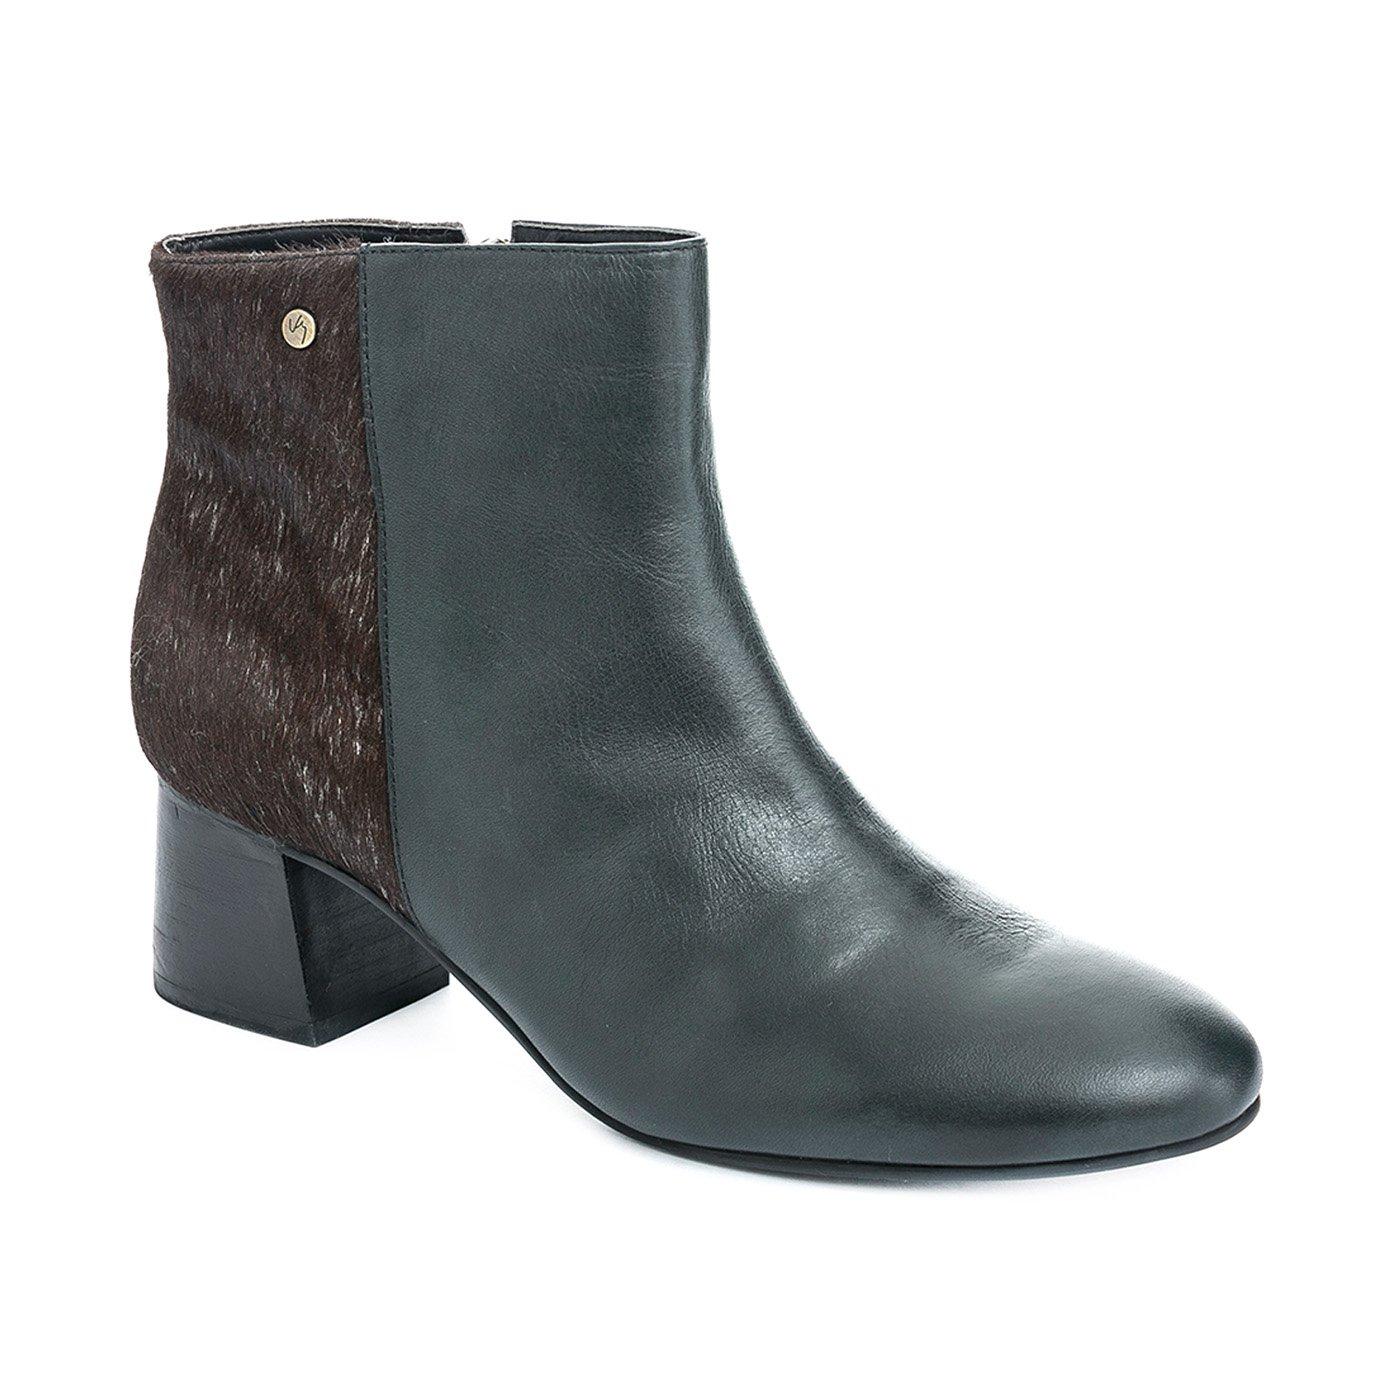 Amazon.com: VELEZ Women Genuine Colombian Leather Ankle Boots | Botas de Cuero Colombianas: Clothing